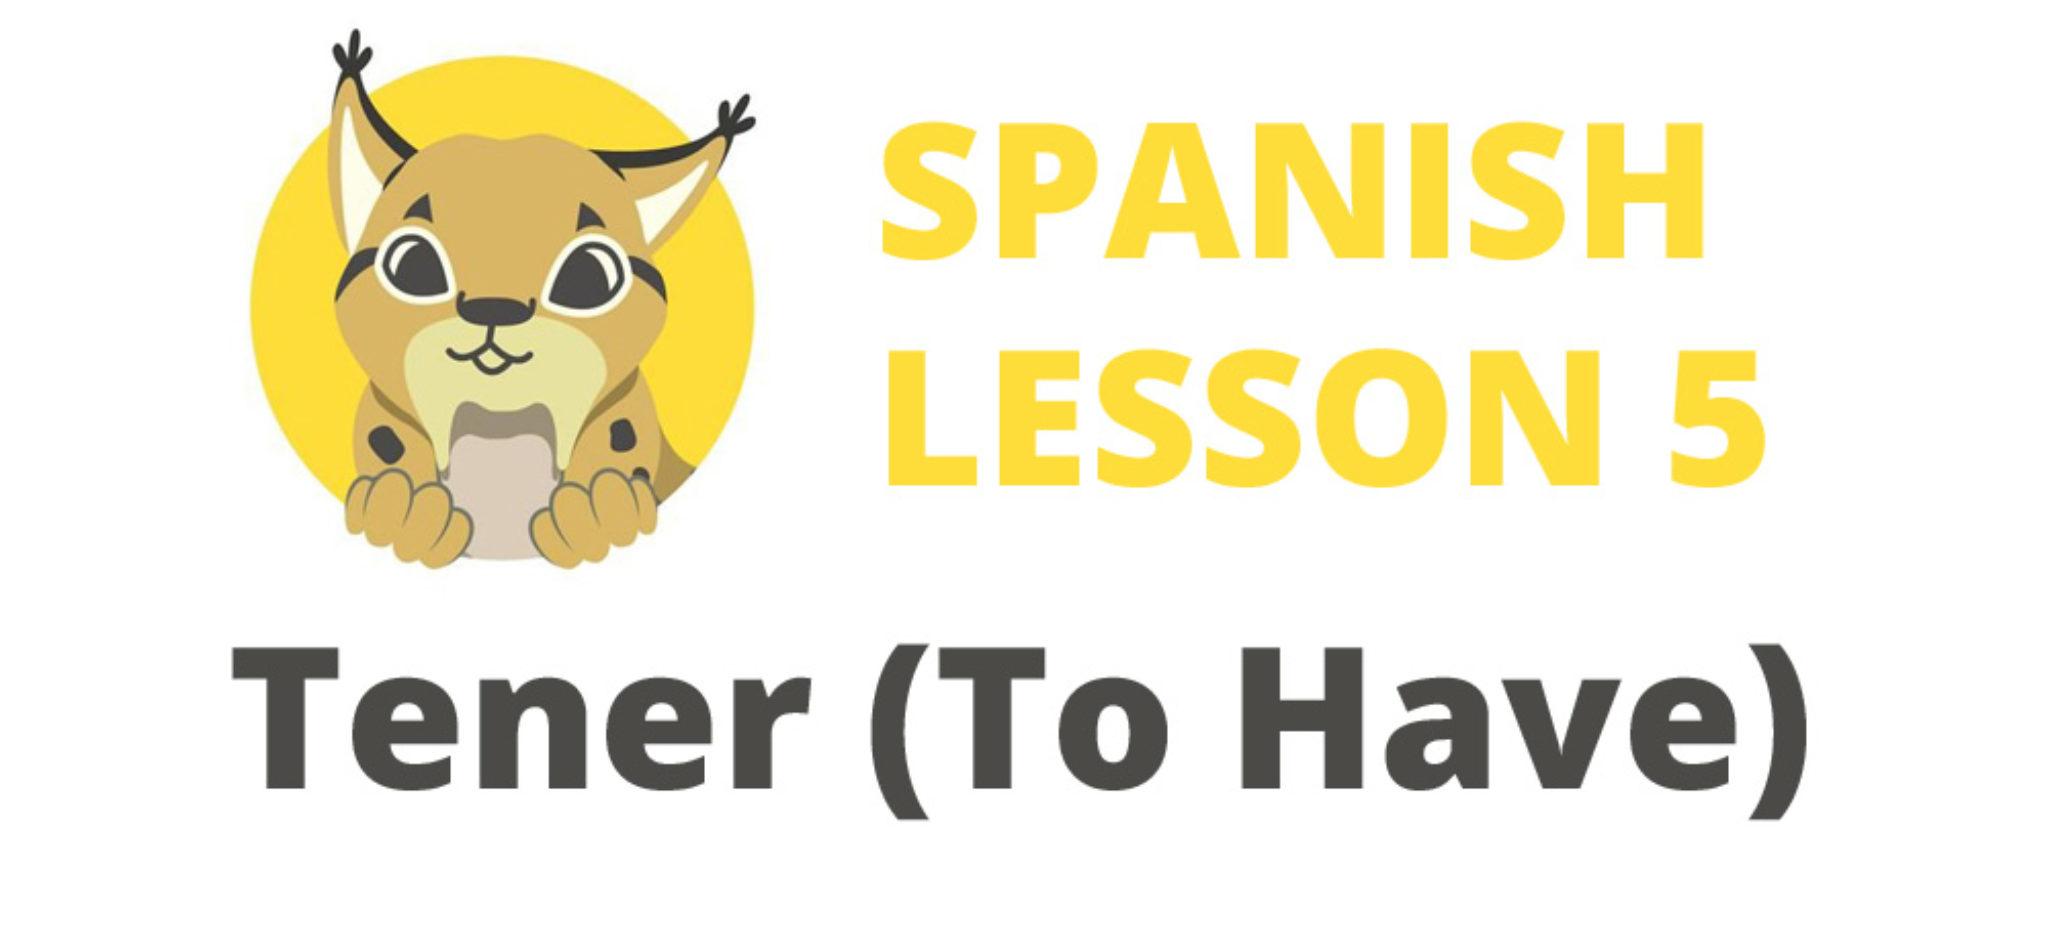 Spanish verb Tener To Have